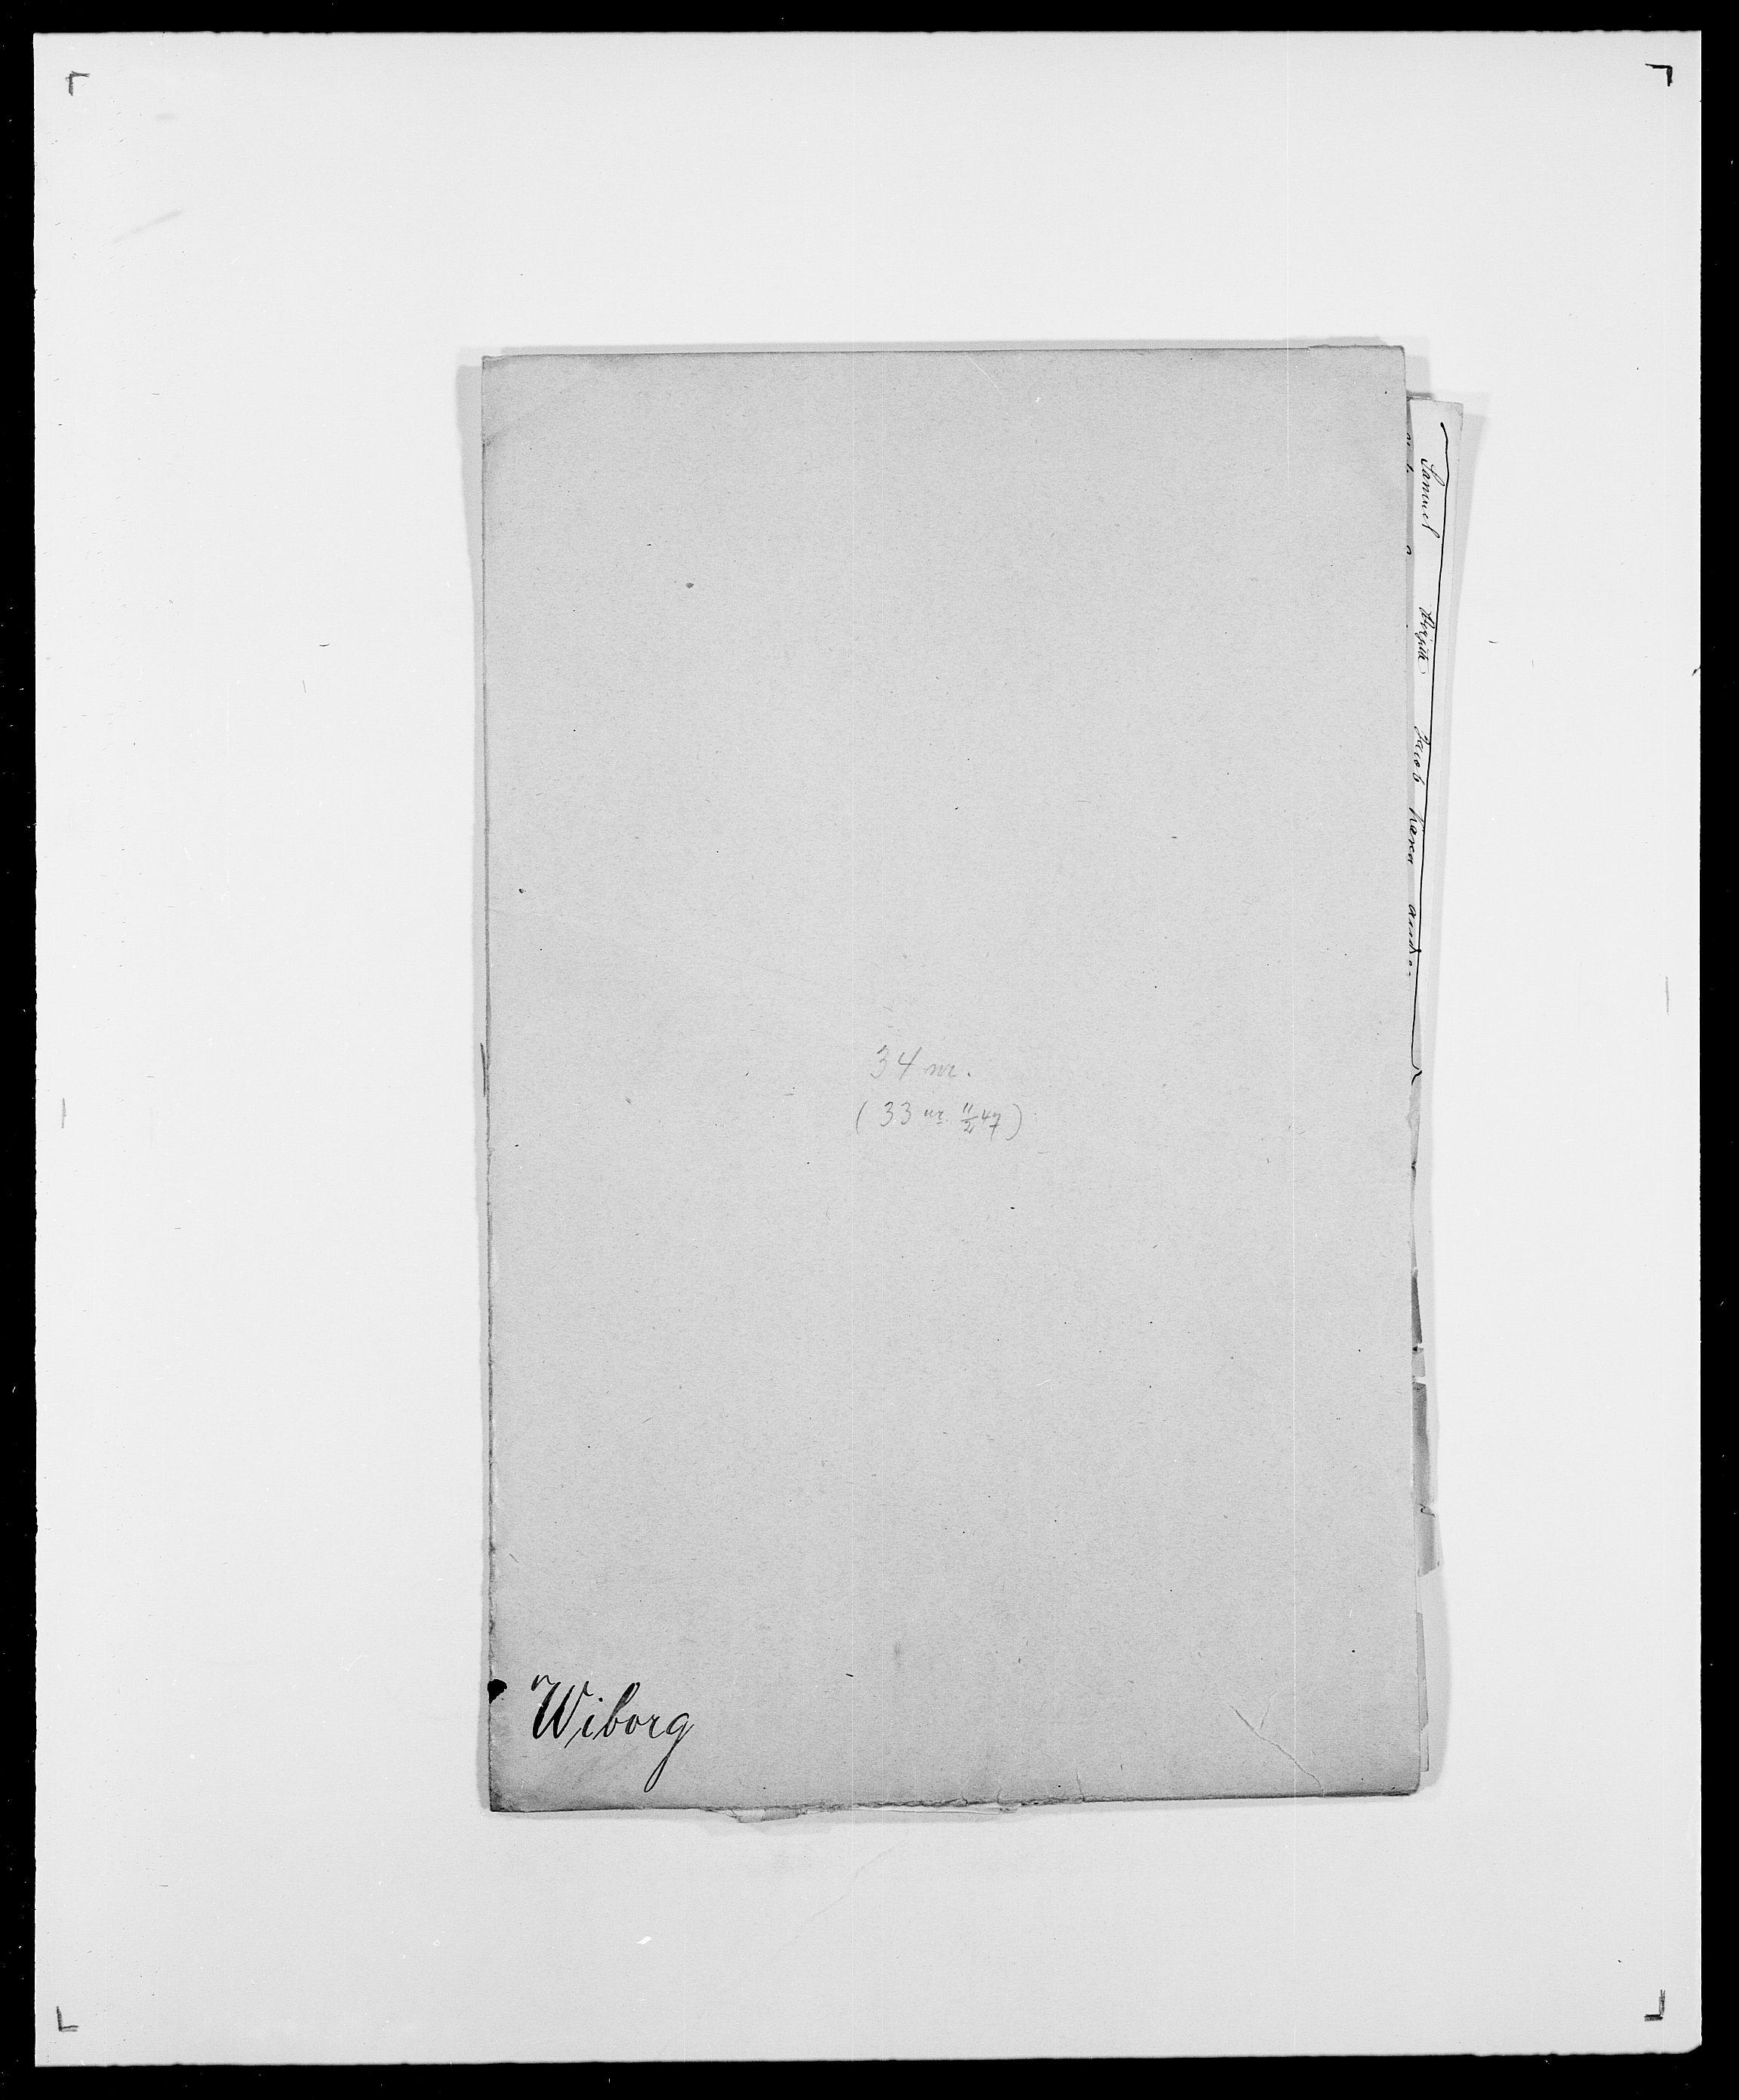 SAO, Delgobe, Charles Antoine - samling, D/Da/L0041: Vemmestad - Viker, s. 398